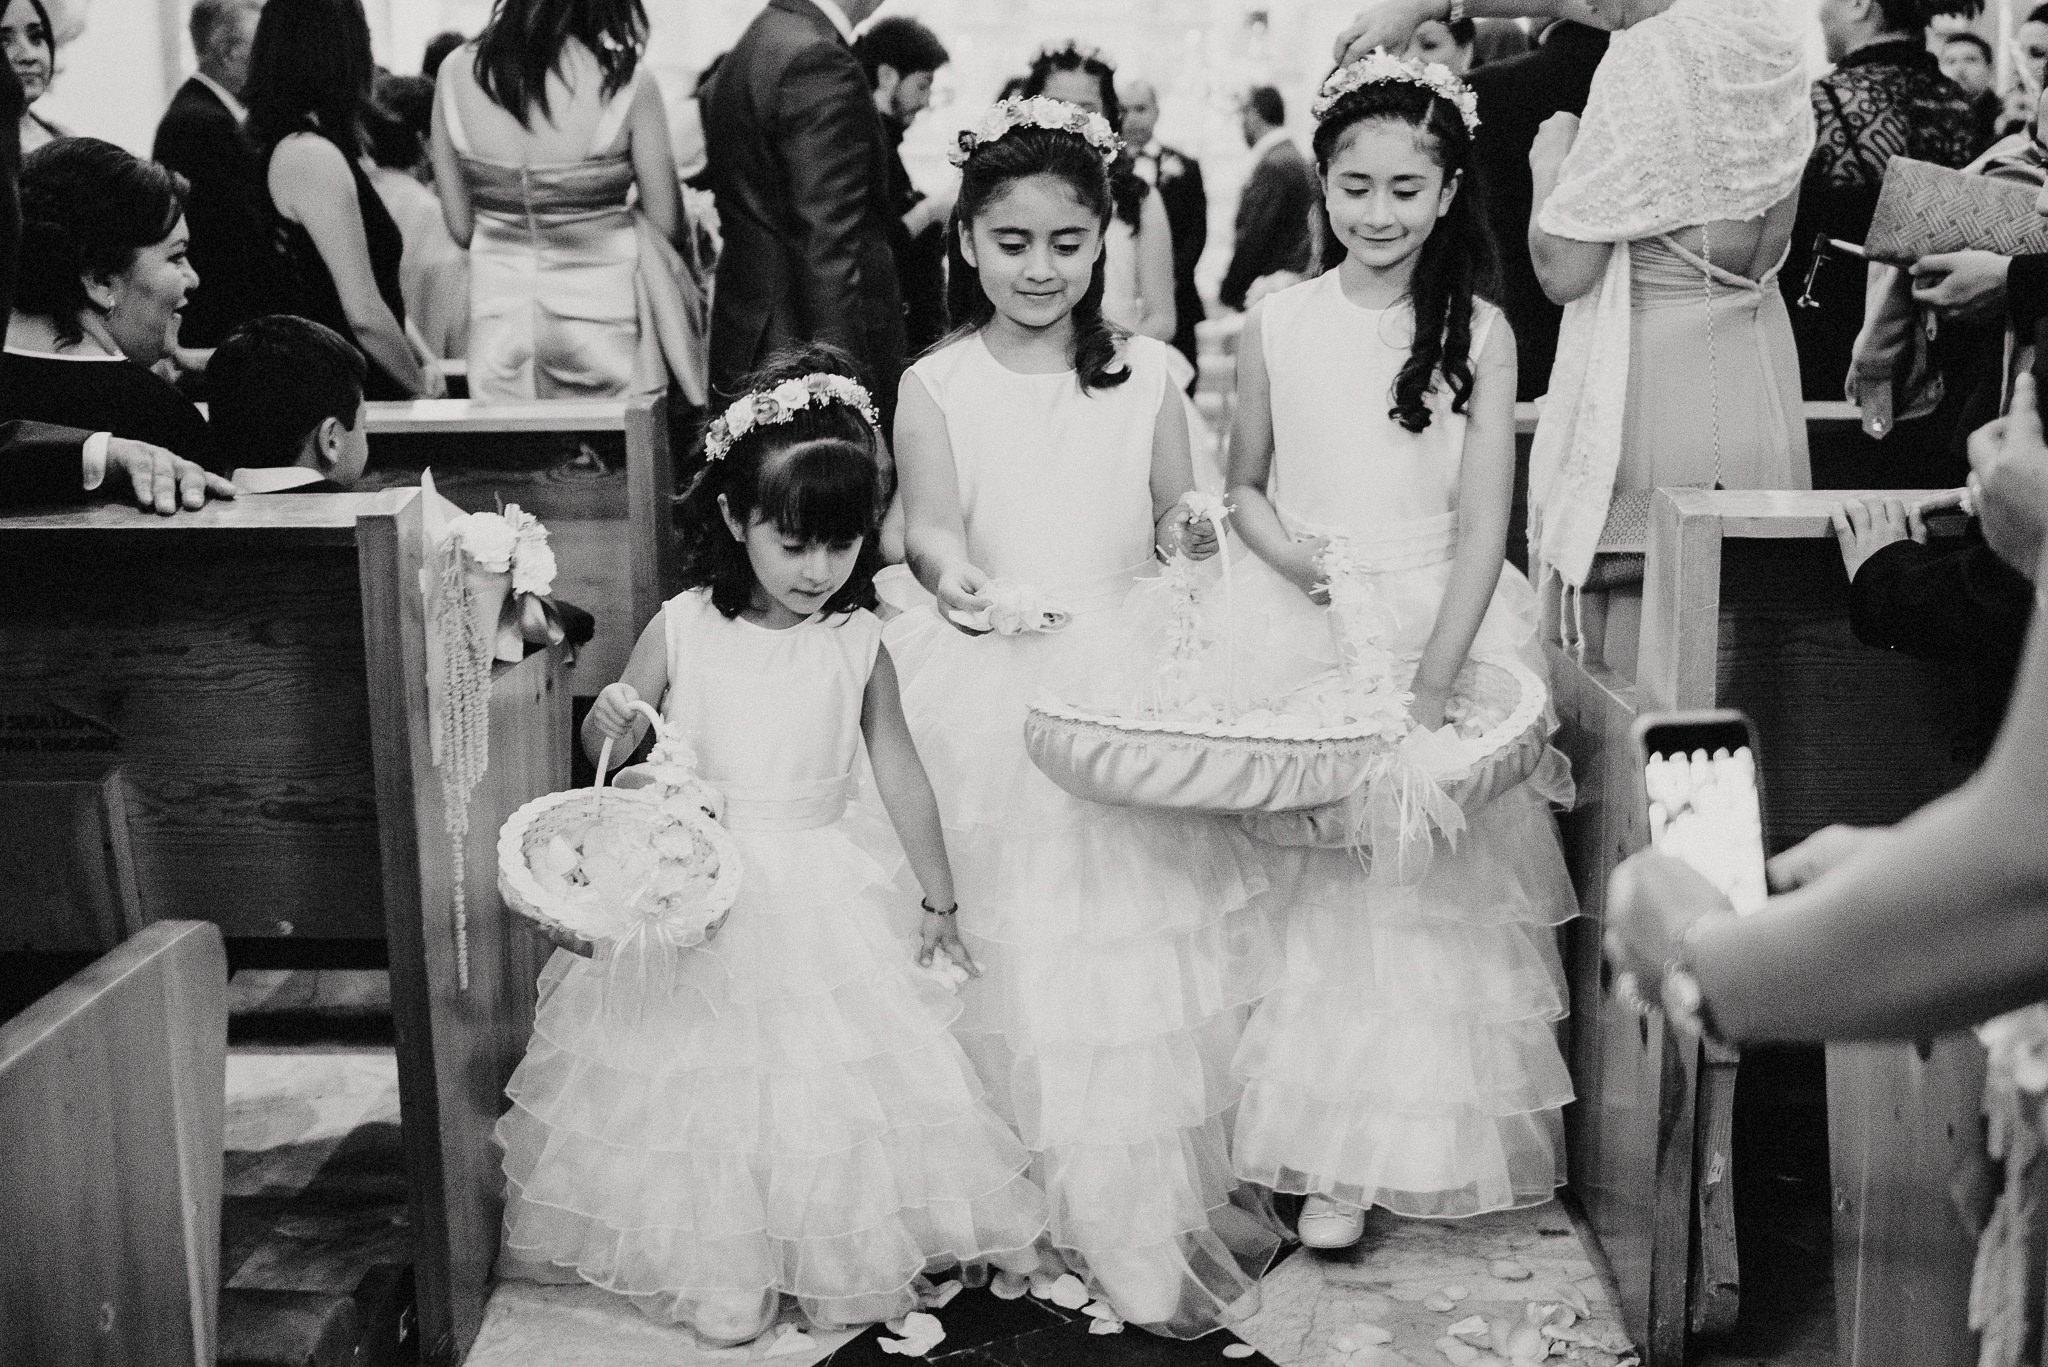 Wedding-Boda-Tulancingo-Hidalgo-Salon-Essenzia-Luis-Houdin-31-film